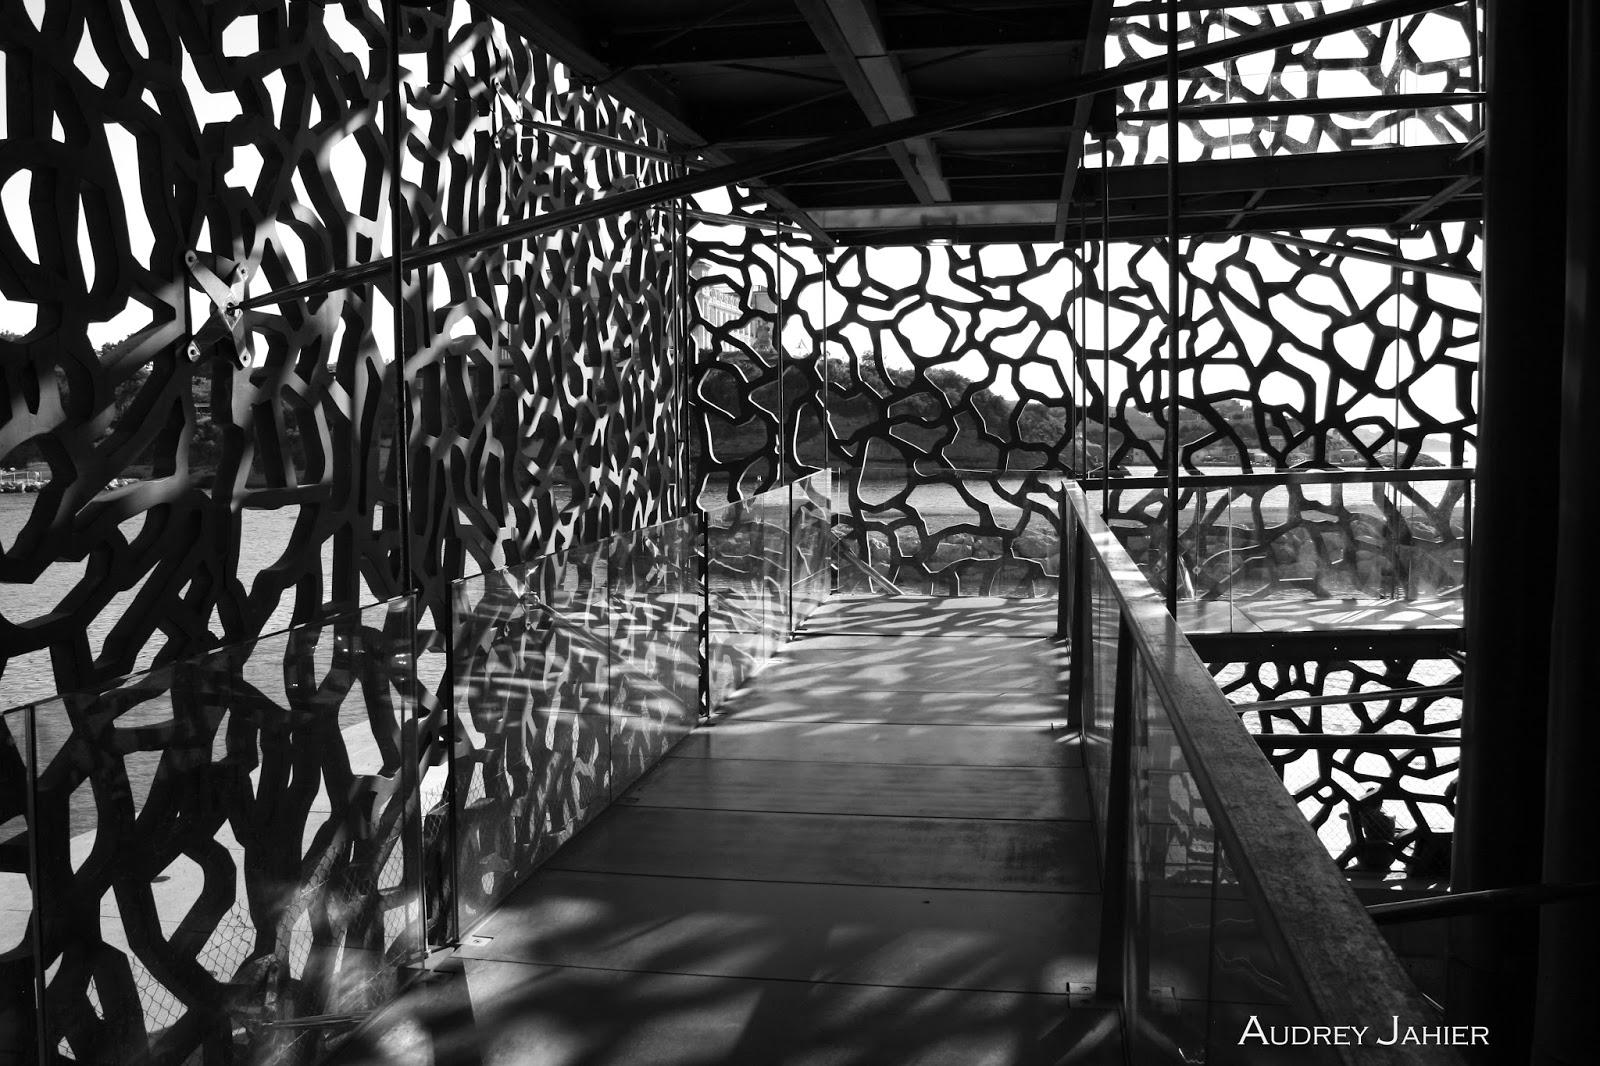 marseille-port-ricciotti-foster-architecture-photographie-france